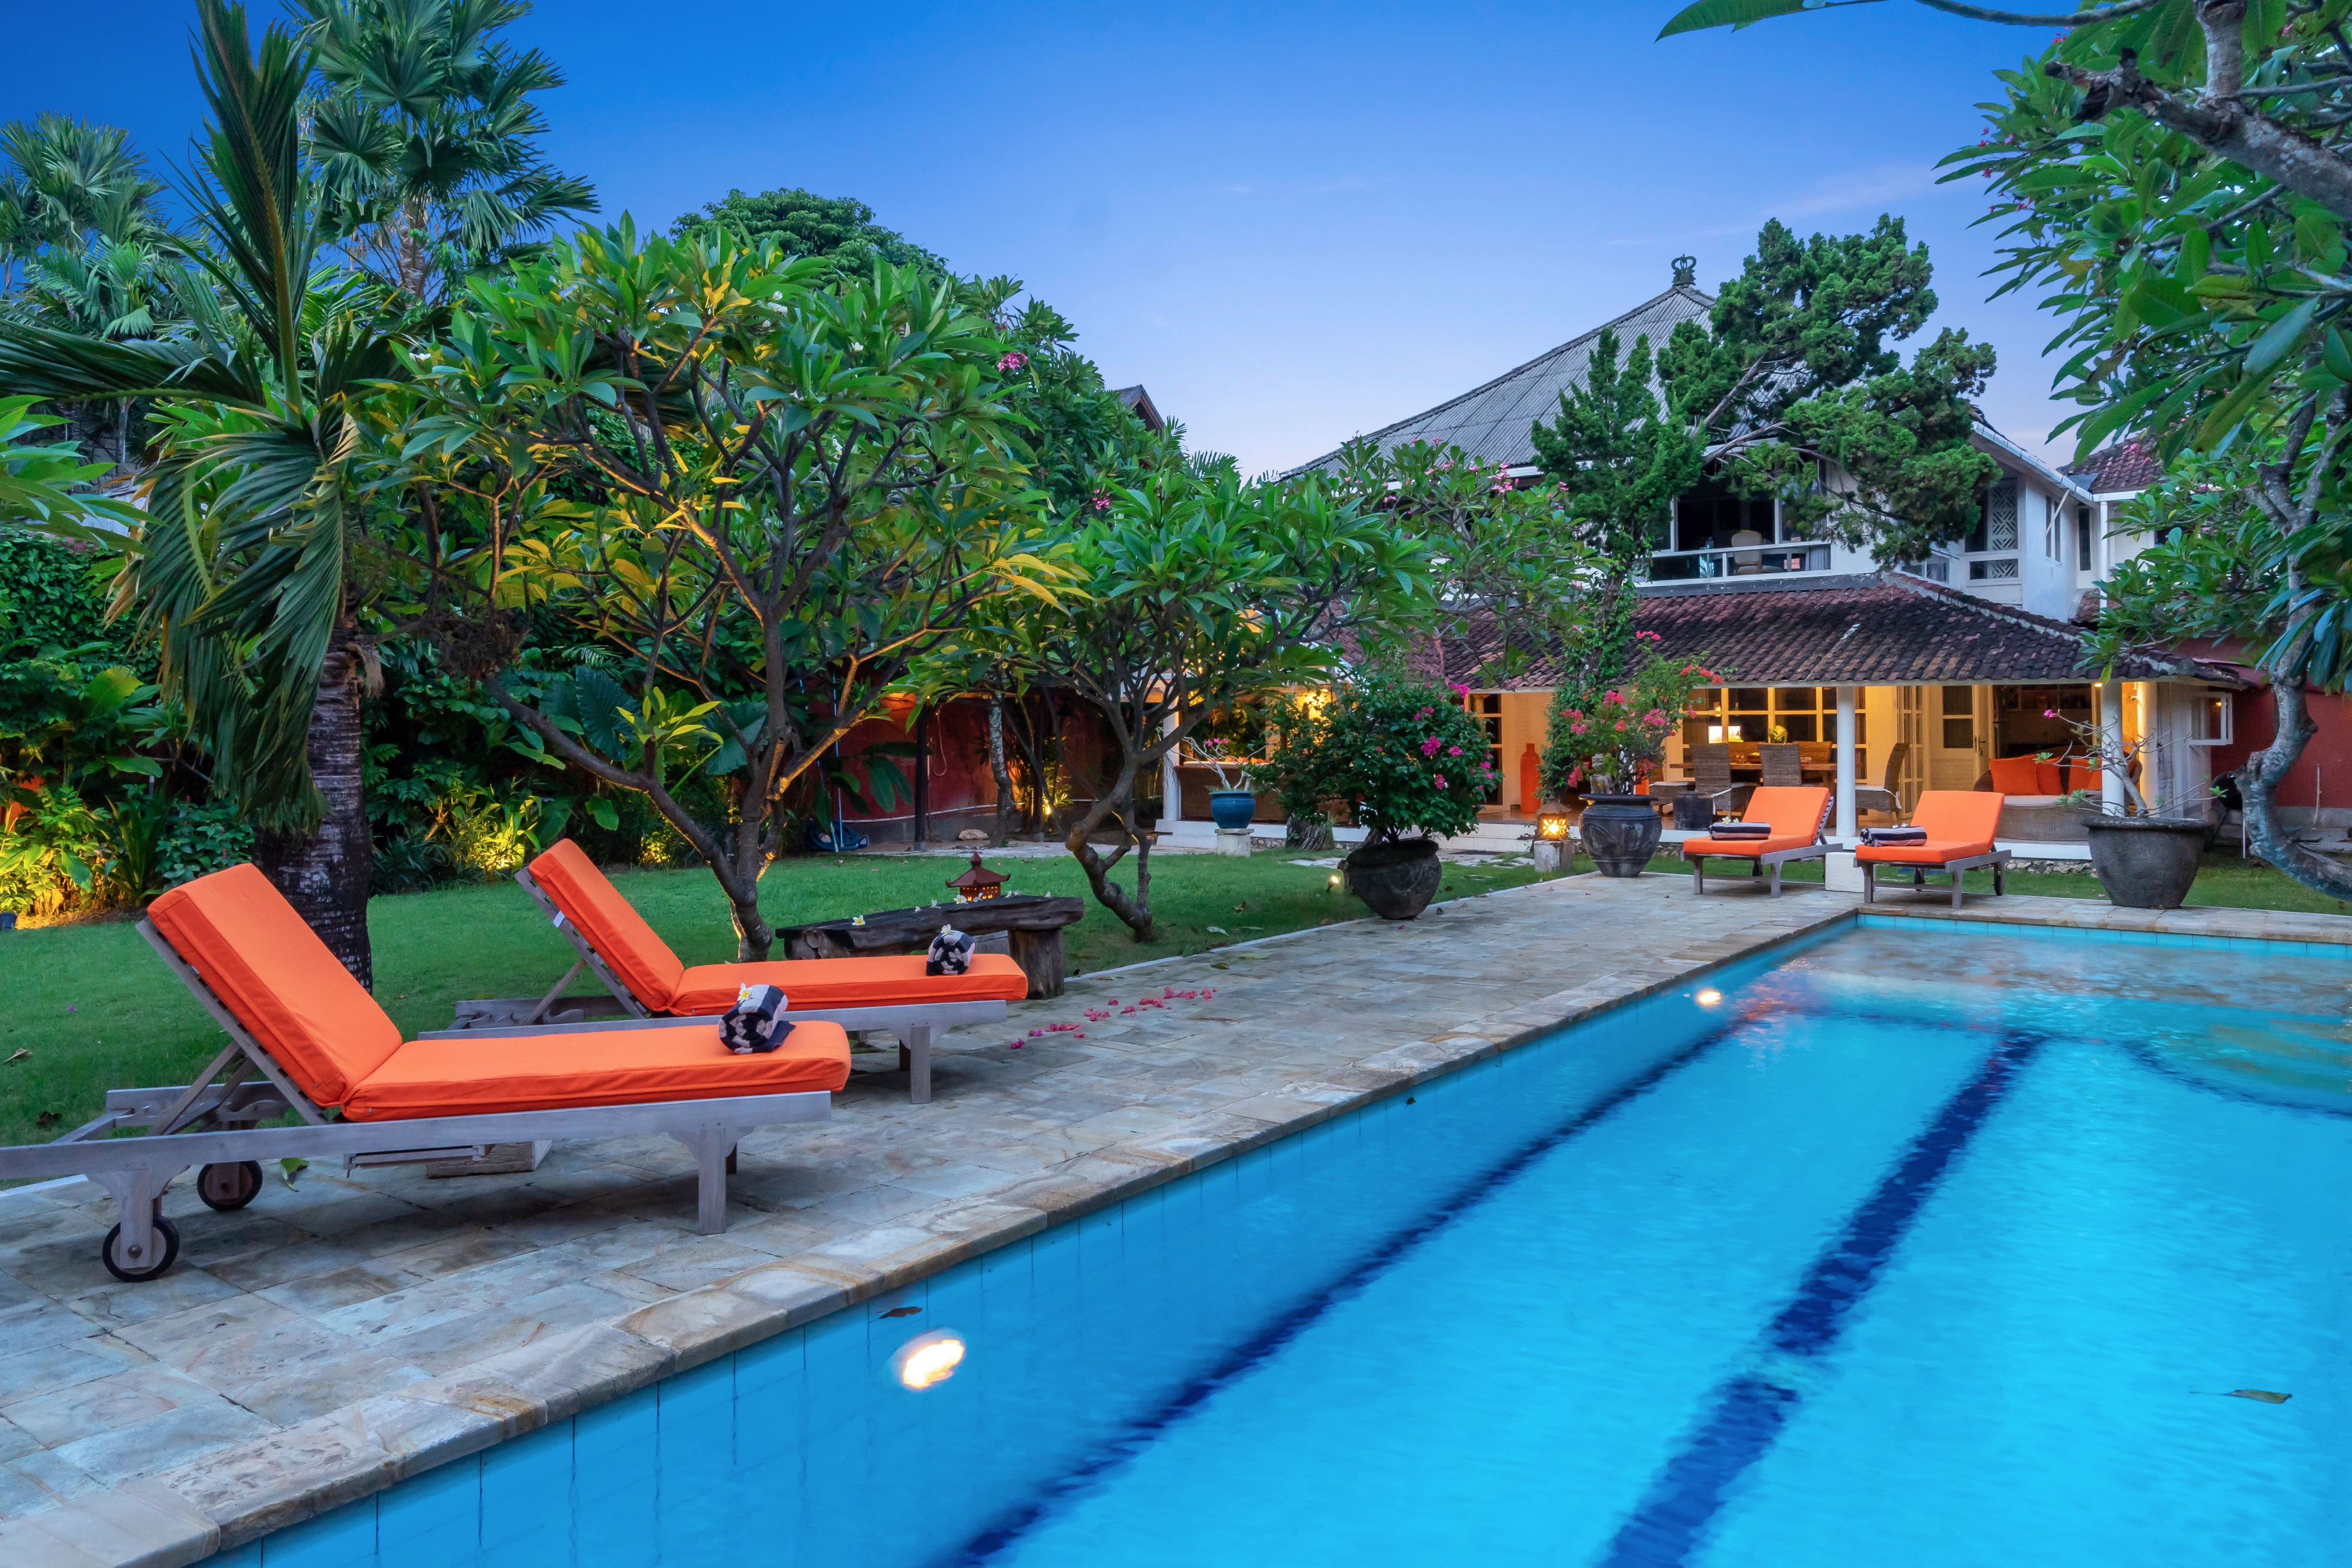 Villa Kubuku Double 6 Seminyak 4 Rooms Villas For Rent In Kuta Bali Indonesia